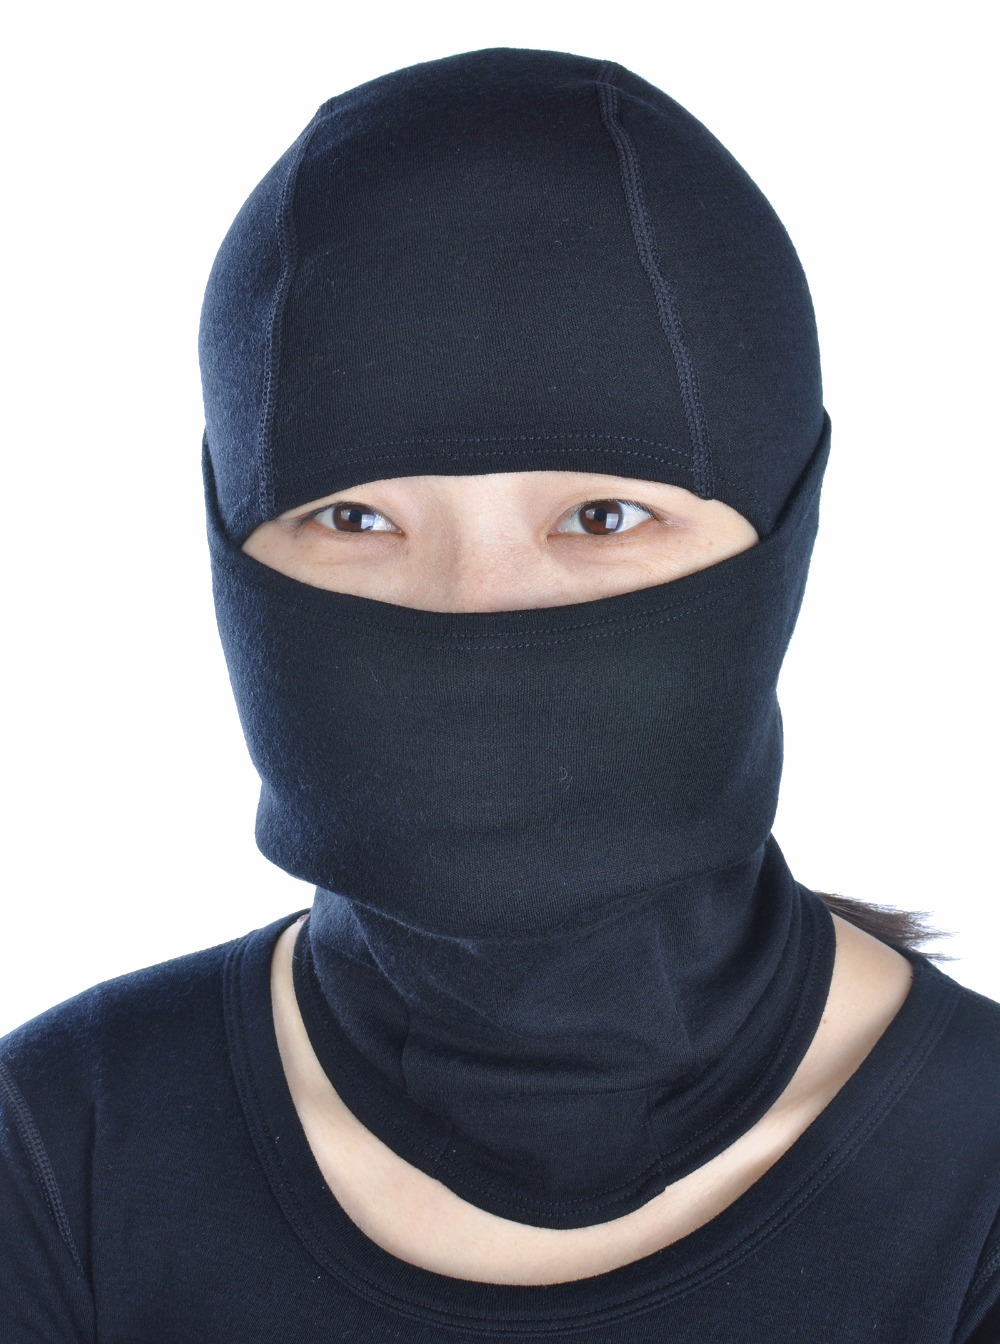 Unisex Men Women 100% Merino Wool Skiing Wind River Balaclava Beanies Hat Head Ears Mouth Thermal Warm Black Firstlite StyleОдежда и ак�е��уары<br><br><br>Aliexpress